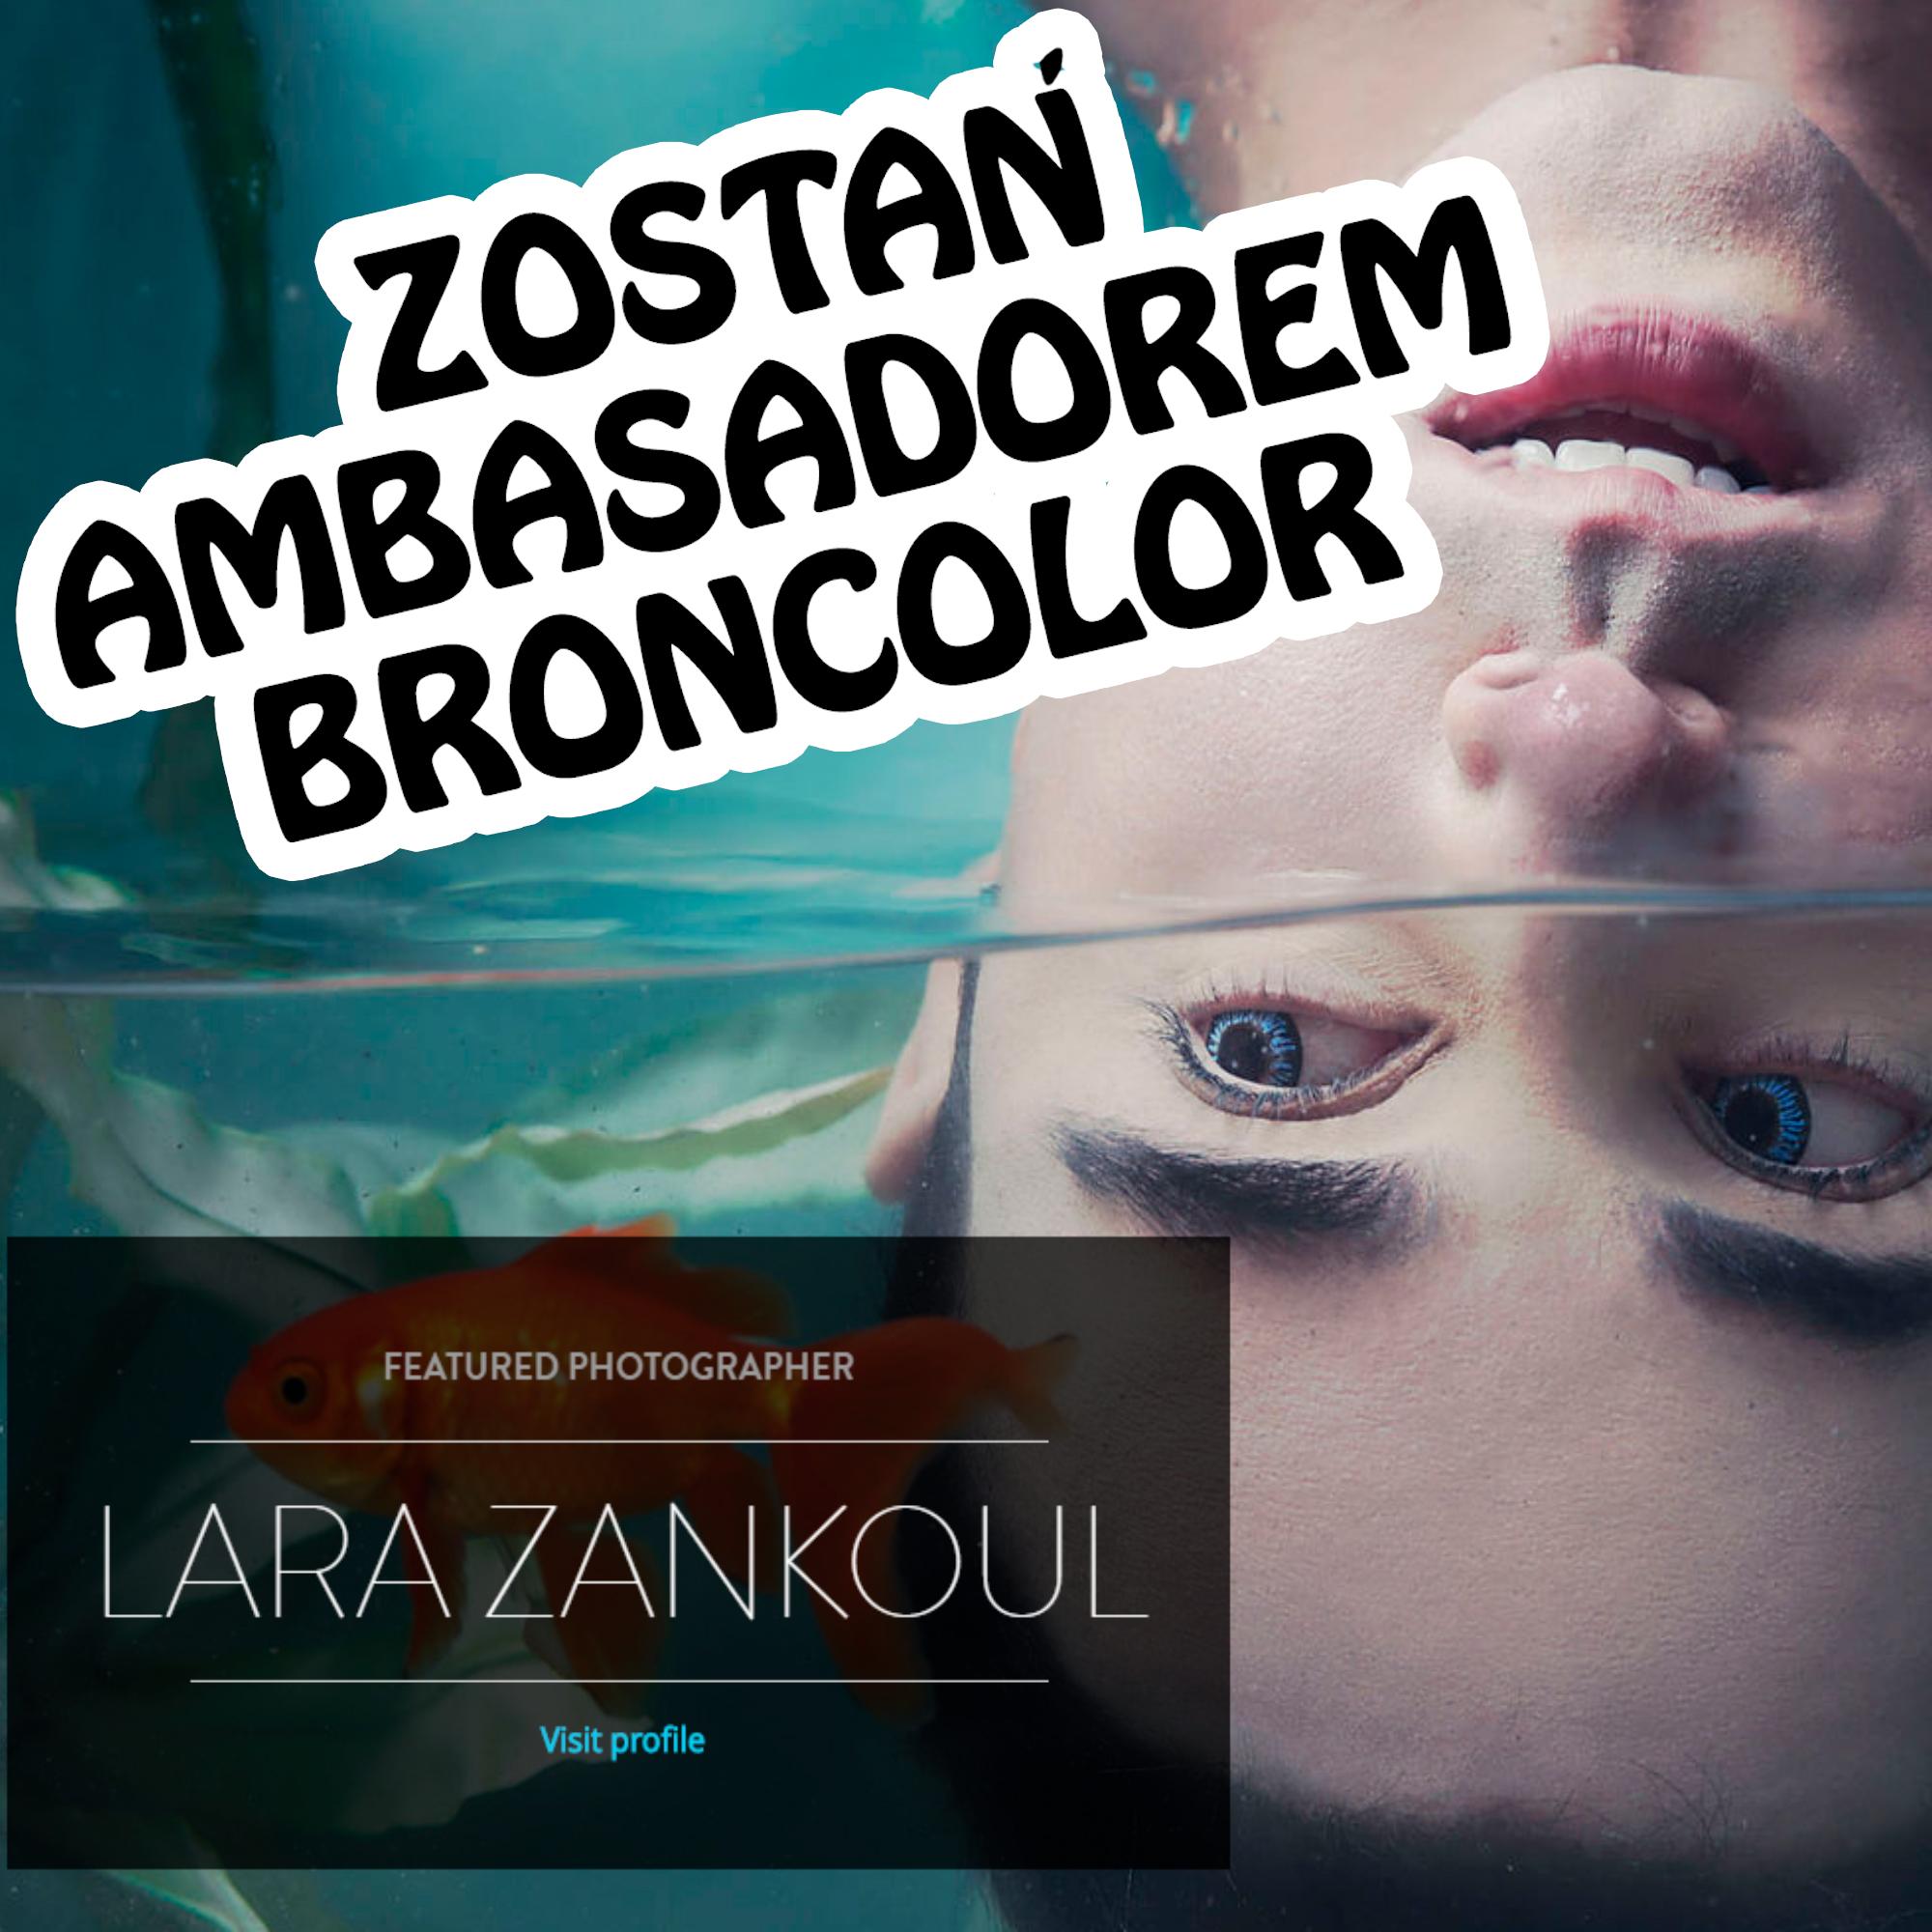 Broncolor szuka ambasadora marki - konkurs 2017